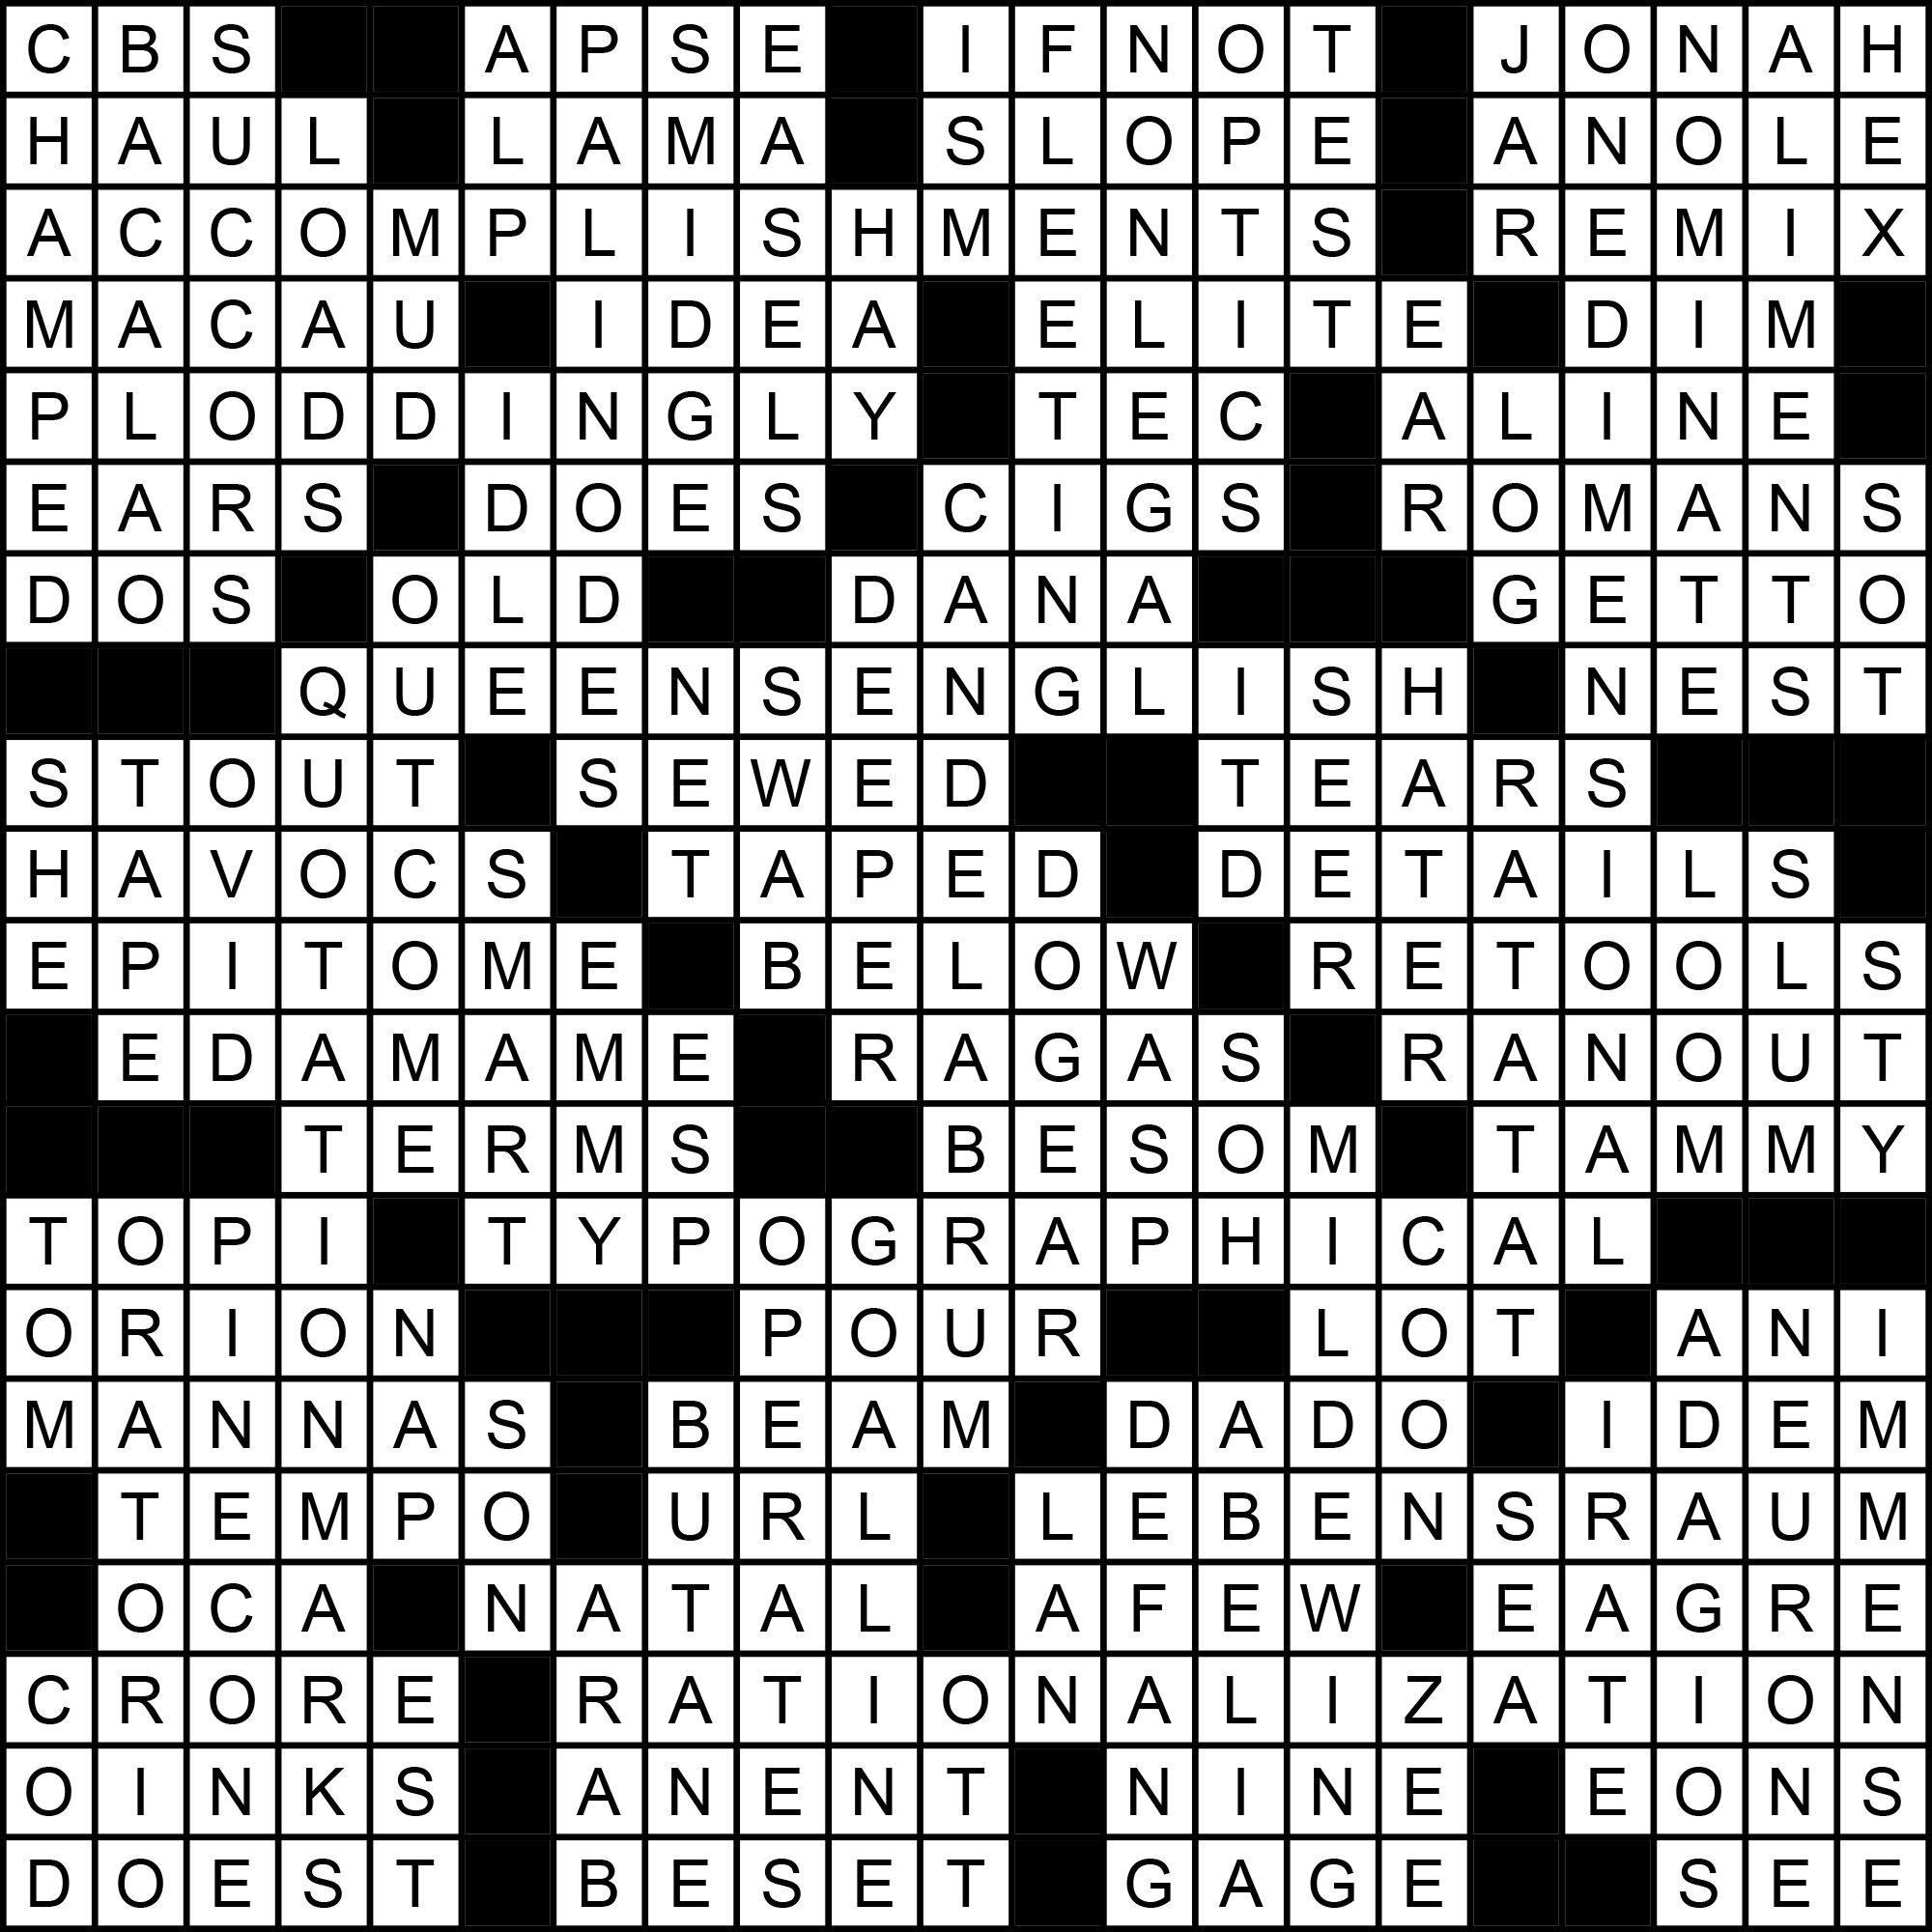 10-4 w-Puzzle key.jpg